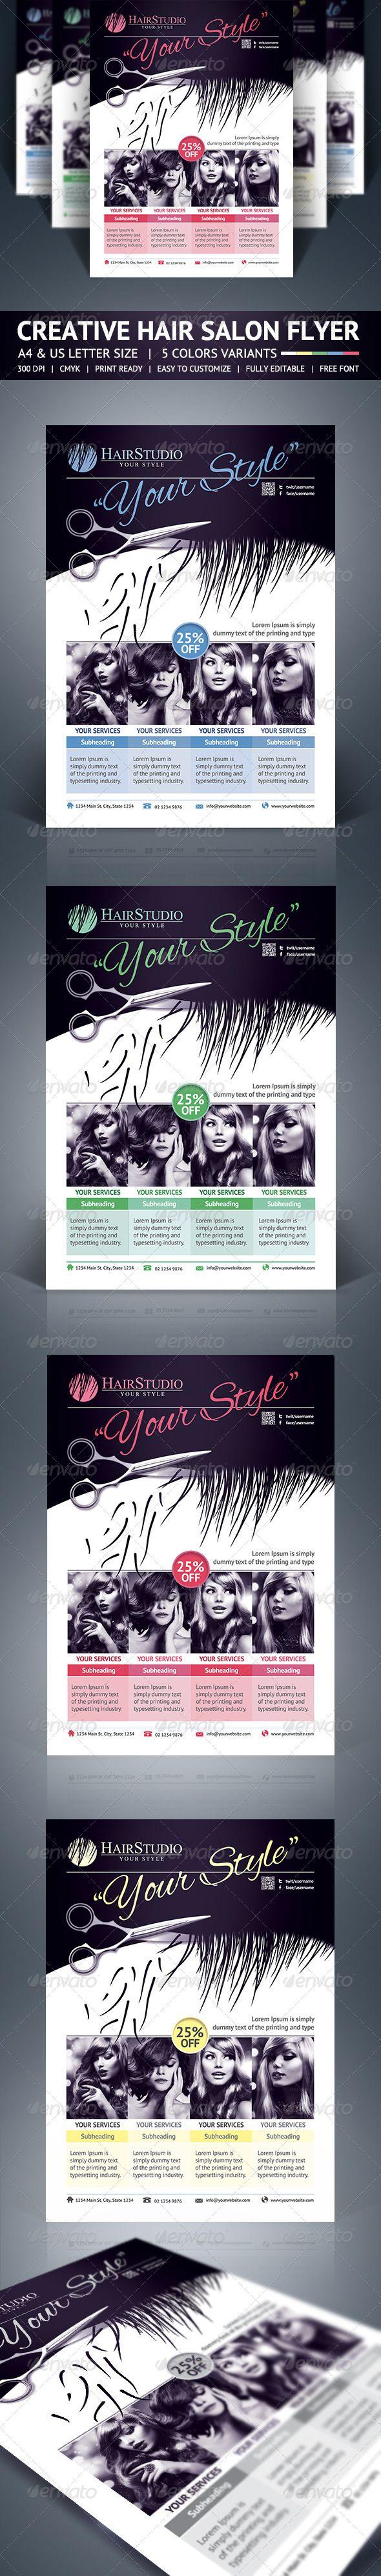 58 best salon marketing images on Pinterest